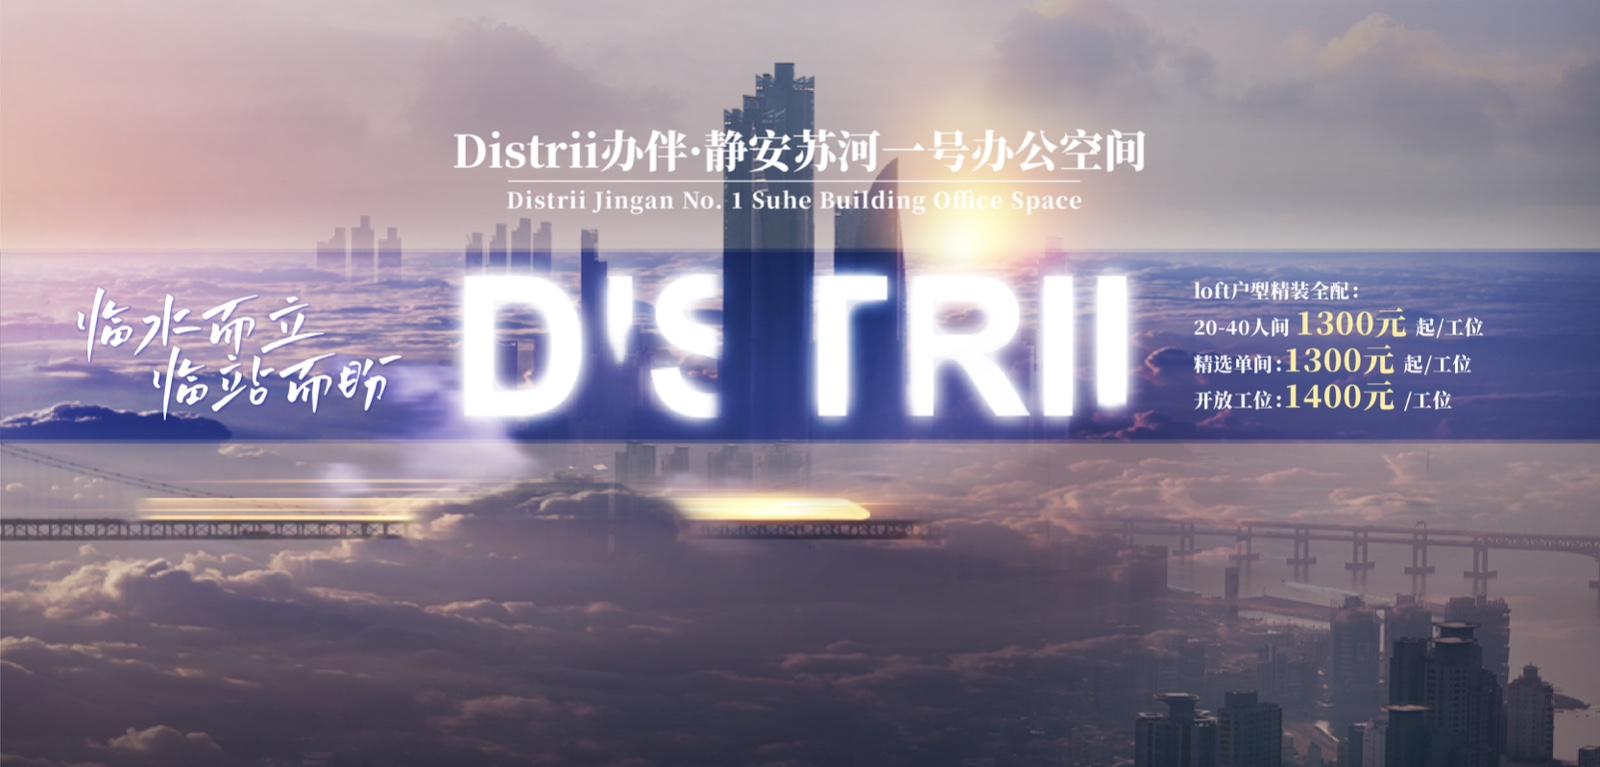 Distrii办伴-知名共享办公品牌